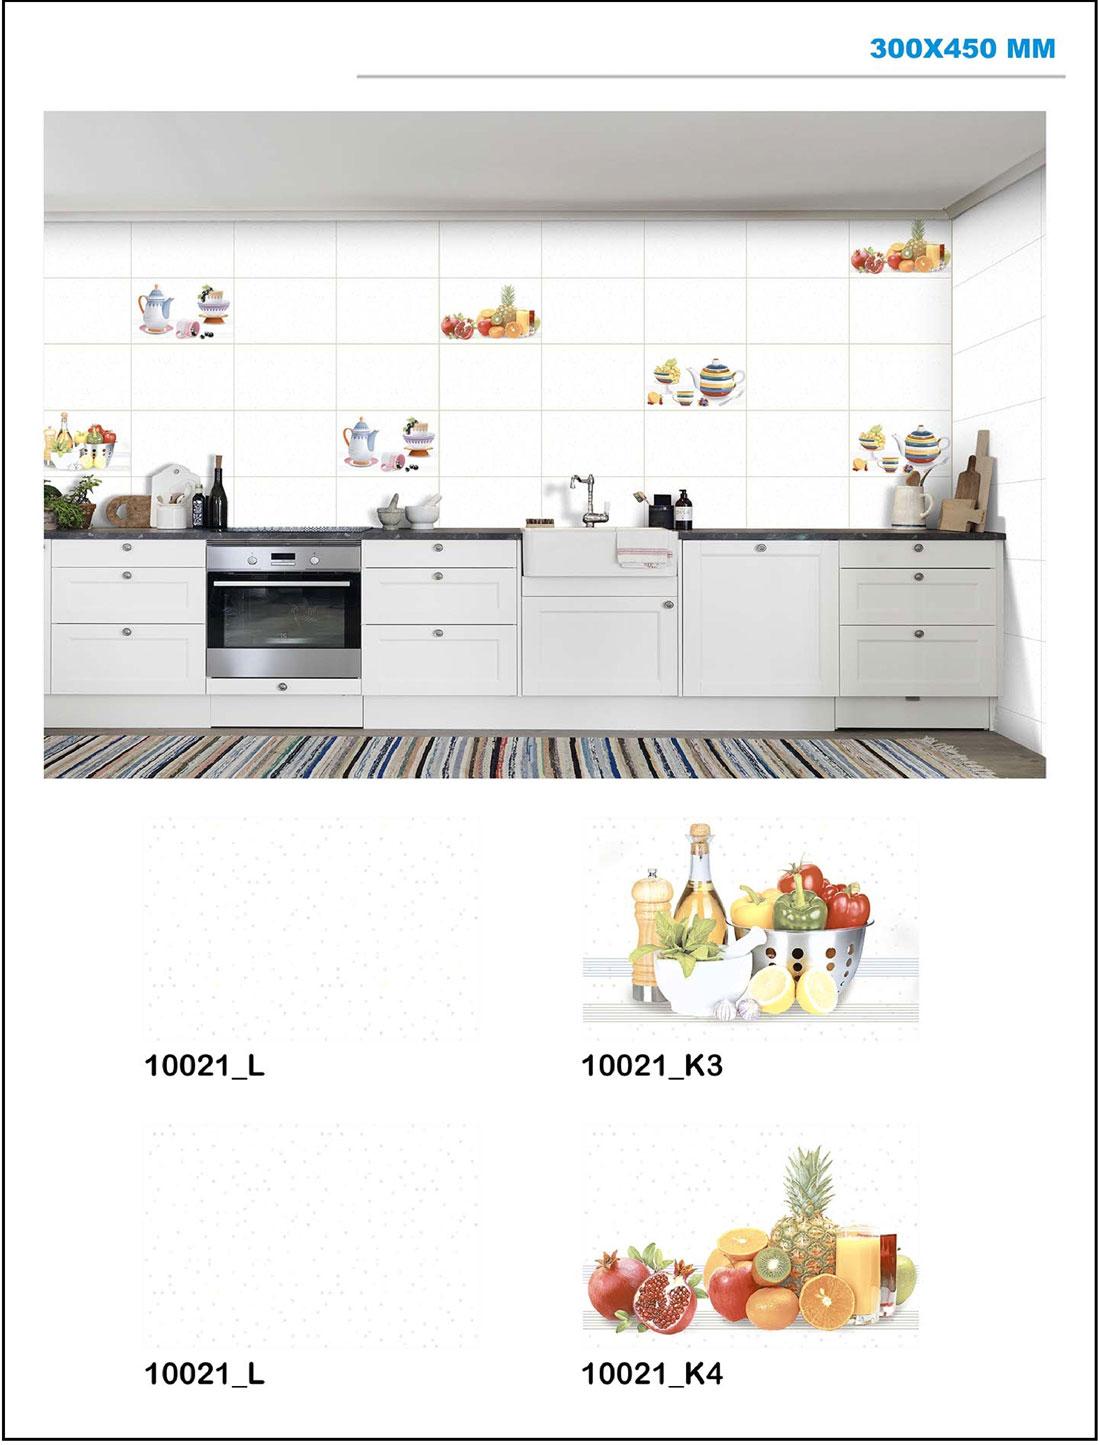 high quality kitchen tiles